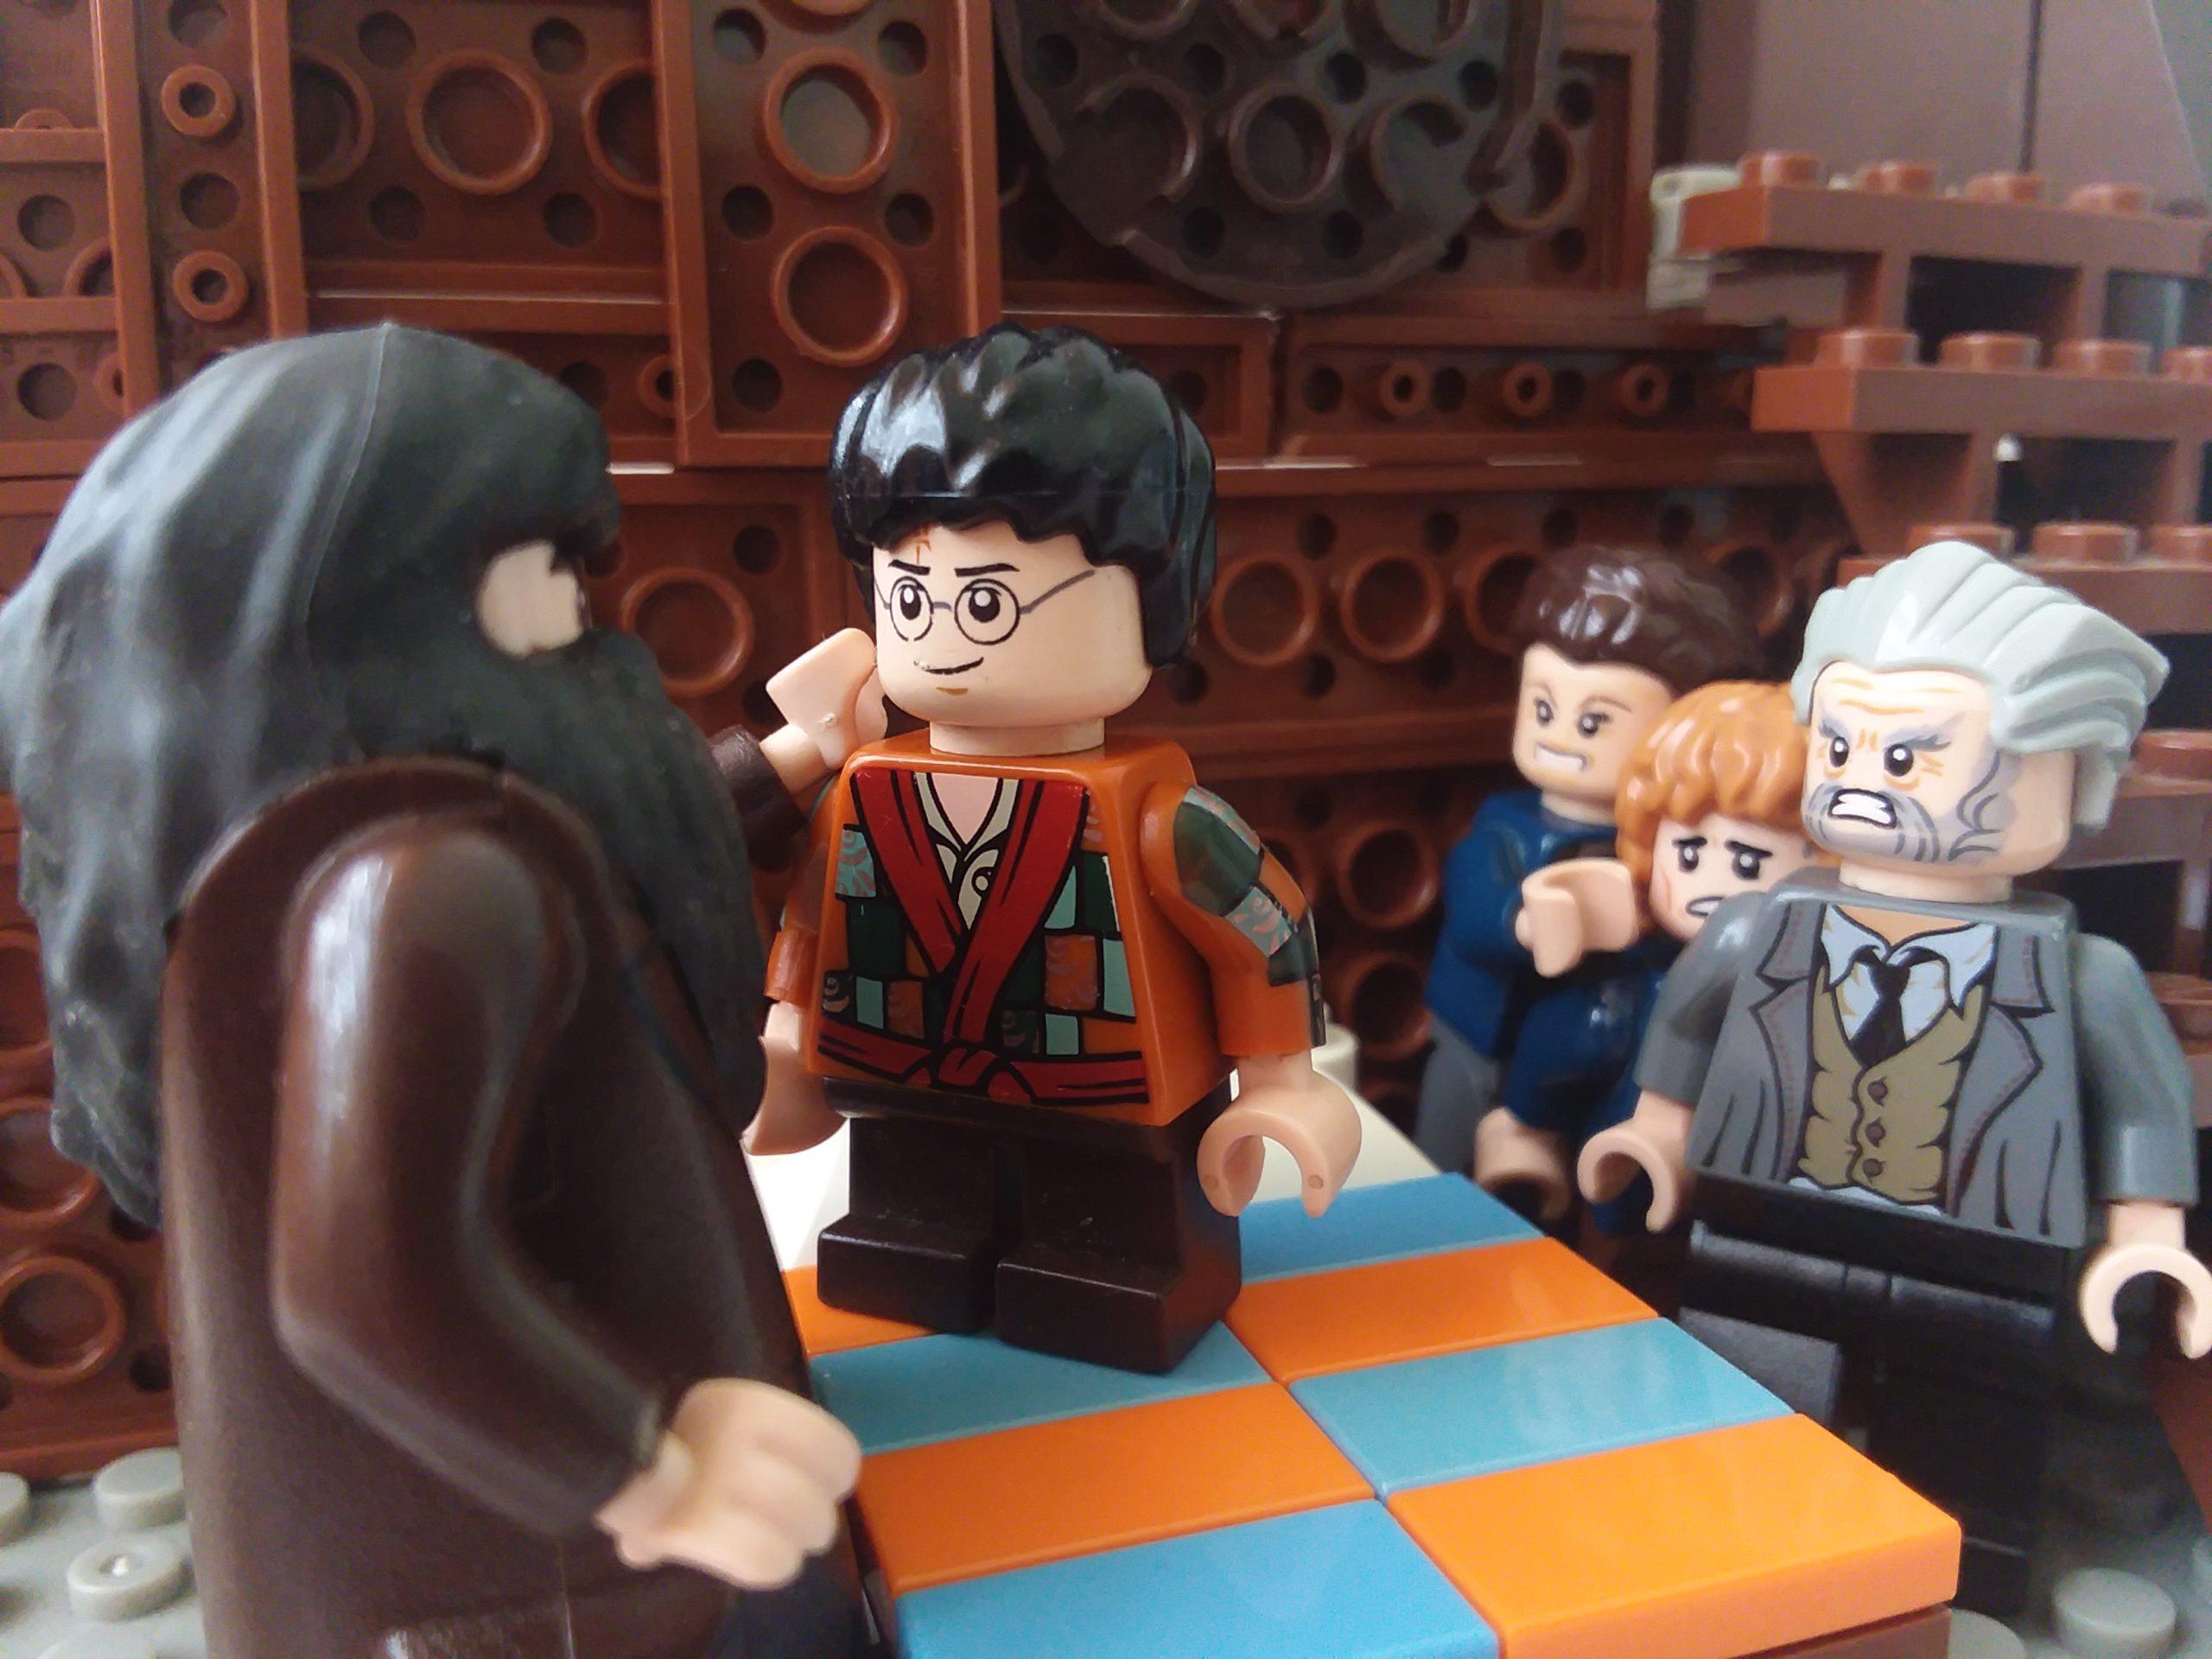 lego harry potter story chapter 4